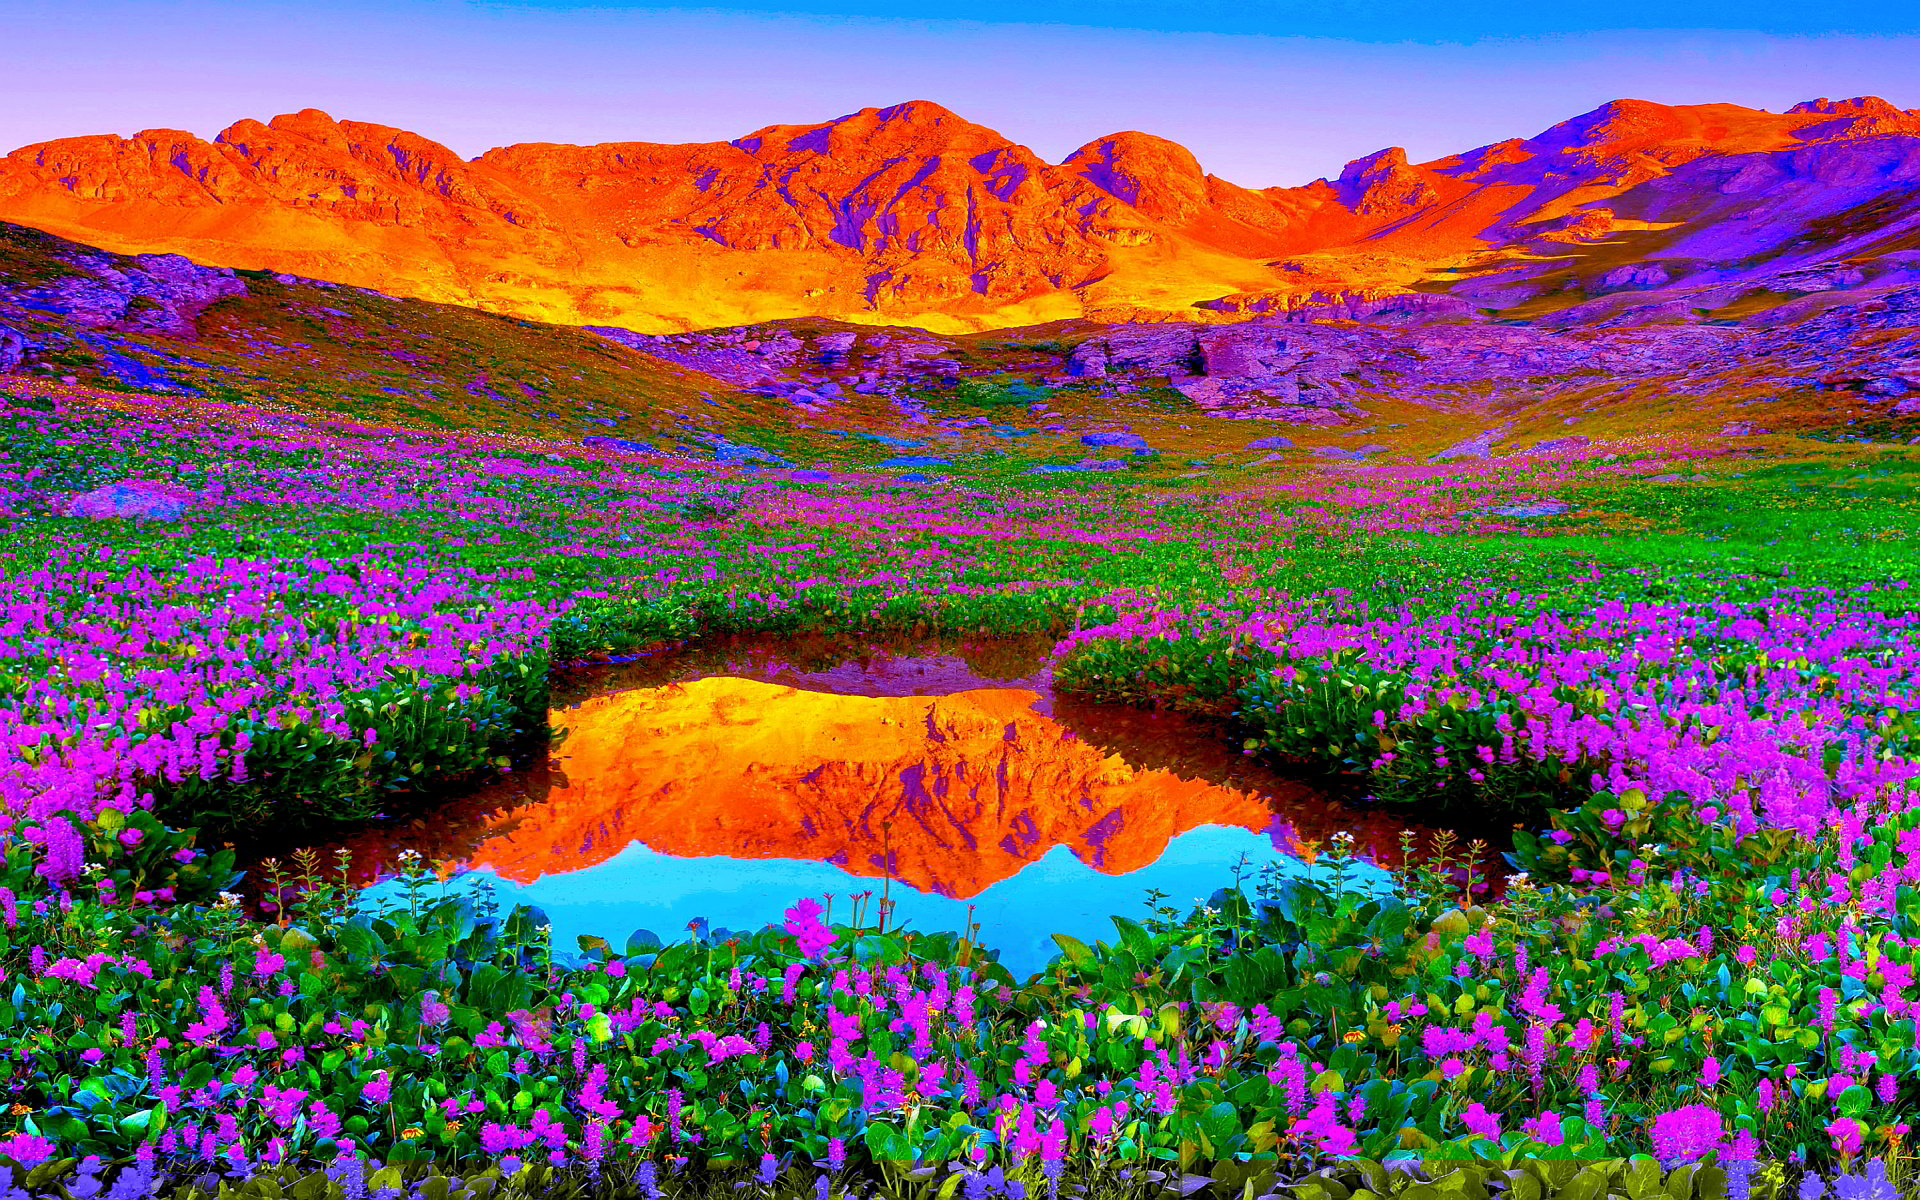 Flora And Fauna Hd Desktop Wallpapers 4k Hd